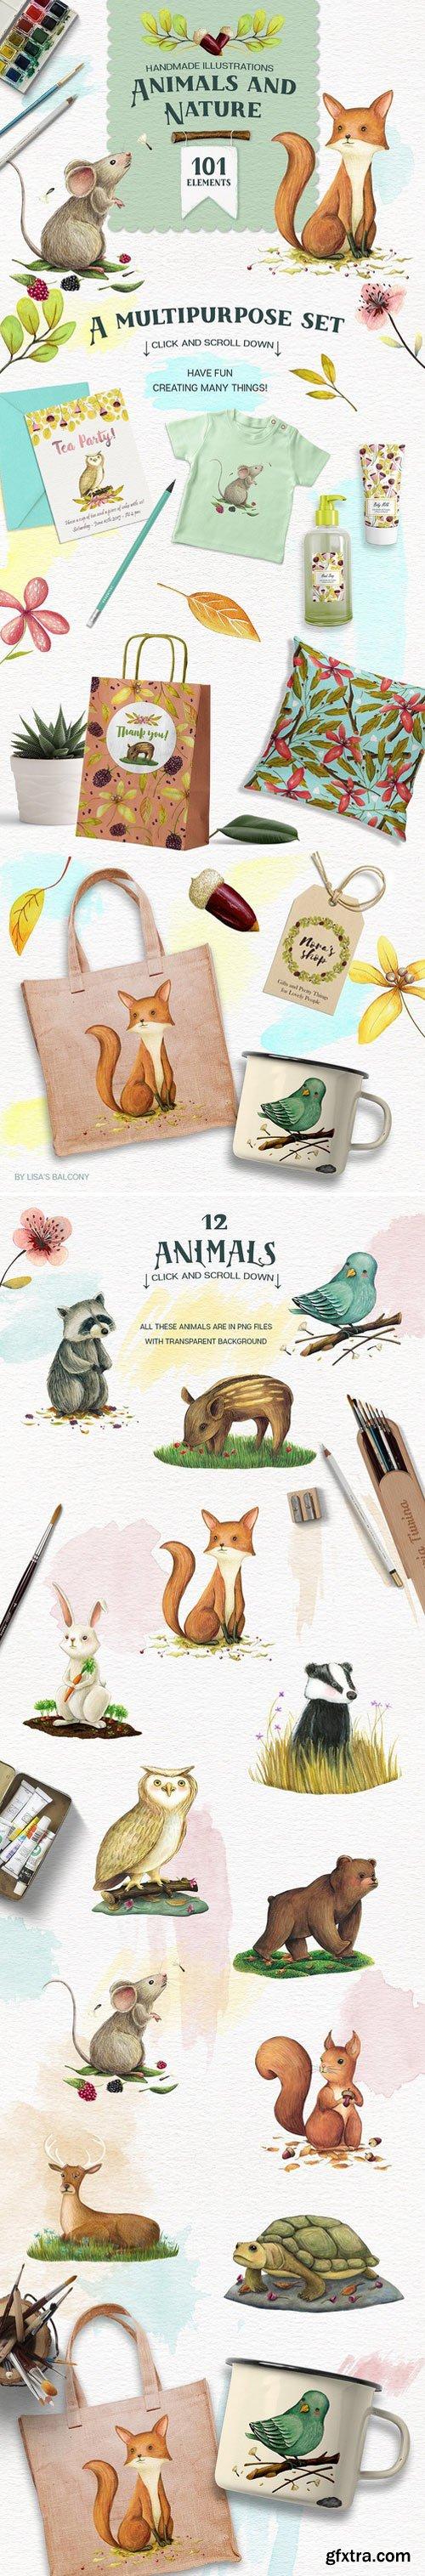 CM - Animals and Nature - Design Kit 1595241